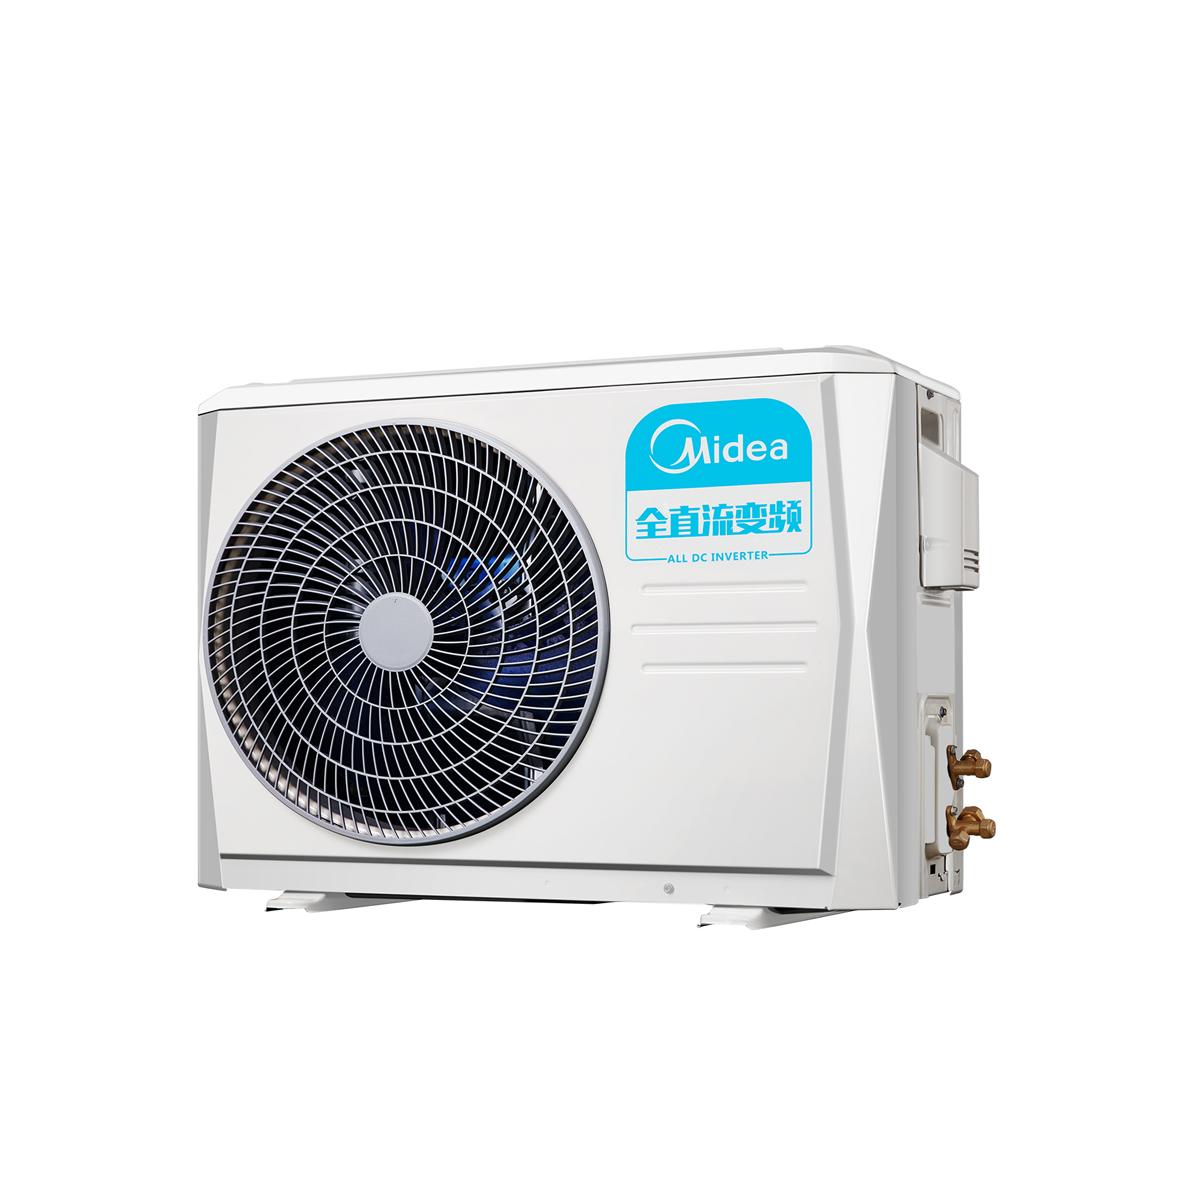 Midea/美的 KFR-35T2W/BP3DN1-TR风管机套机 说明书.pdf